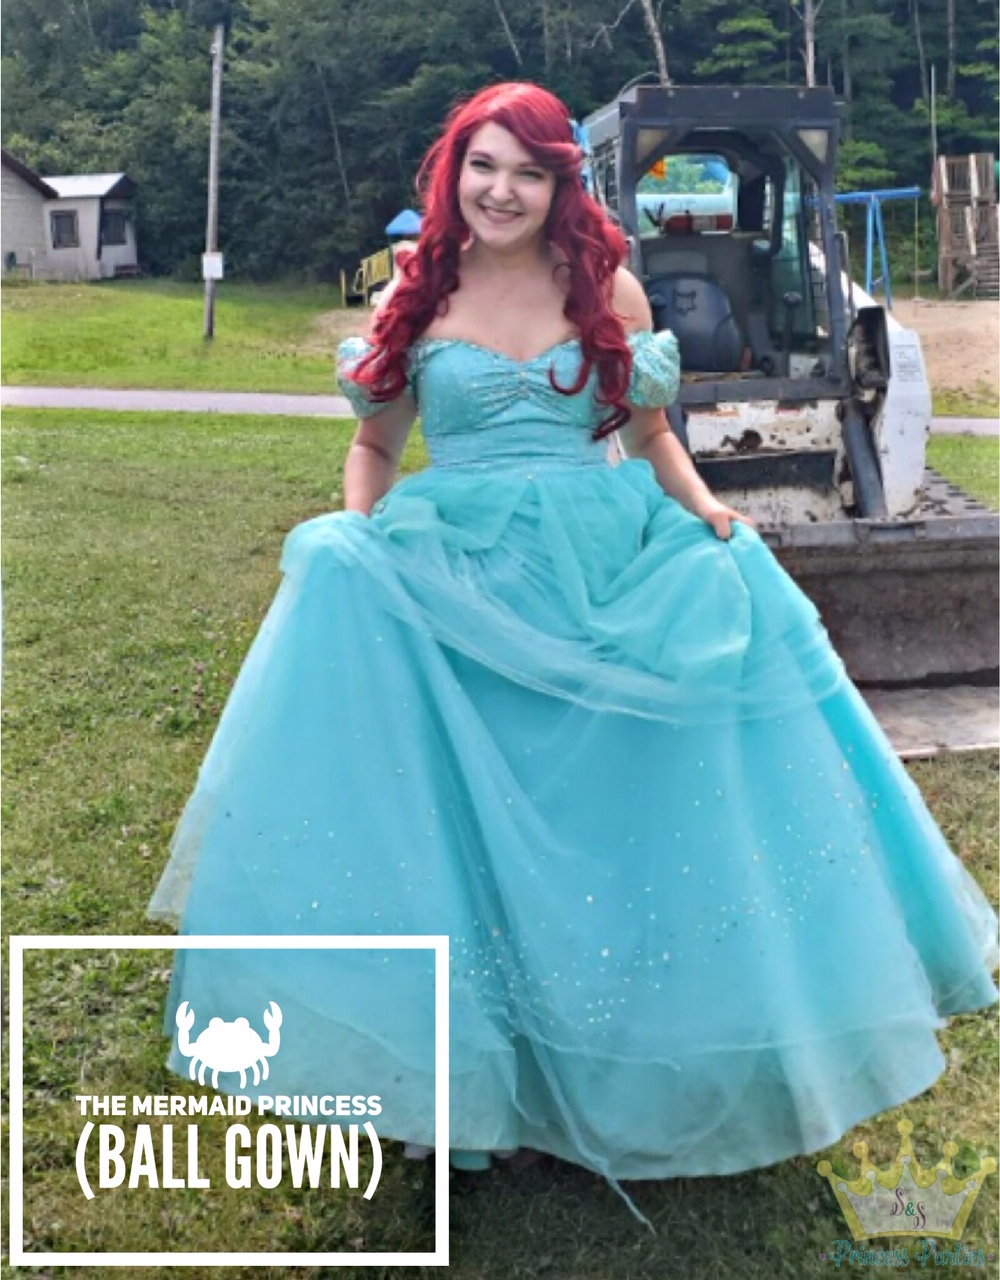 Mermaid Princess Ball Gown.jpeg